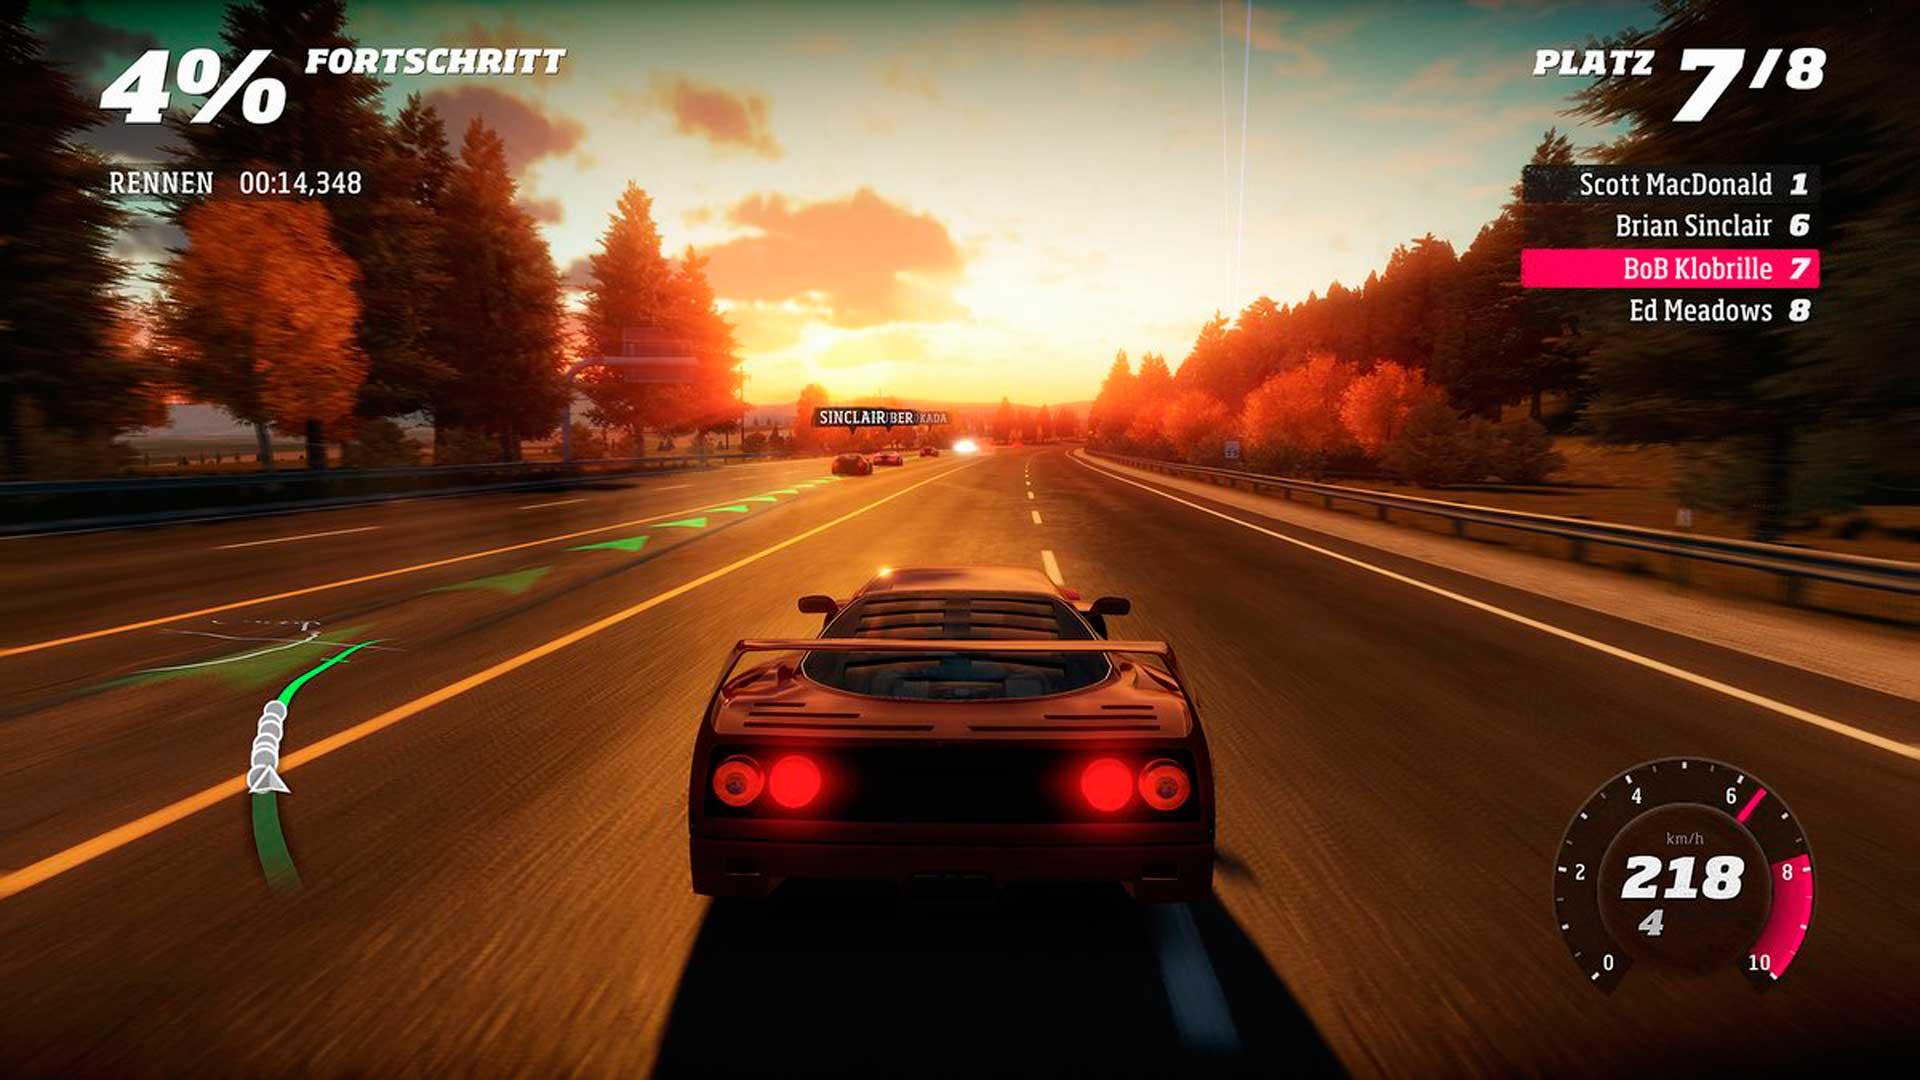 Así se ven The Witcher 2, Forza Horizon, Crackdown y Fable en Xbox One X 2